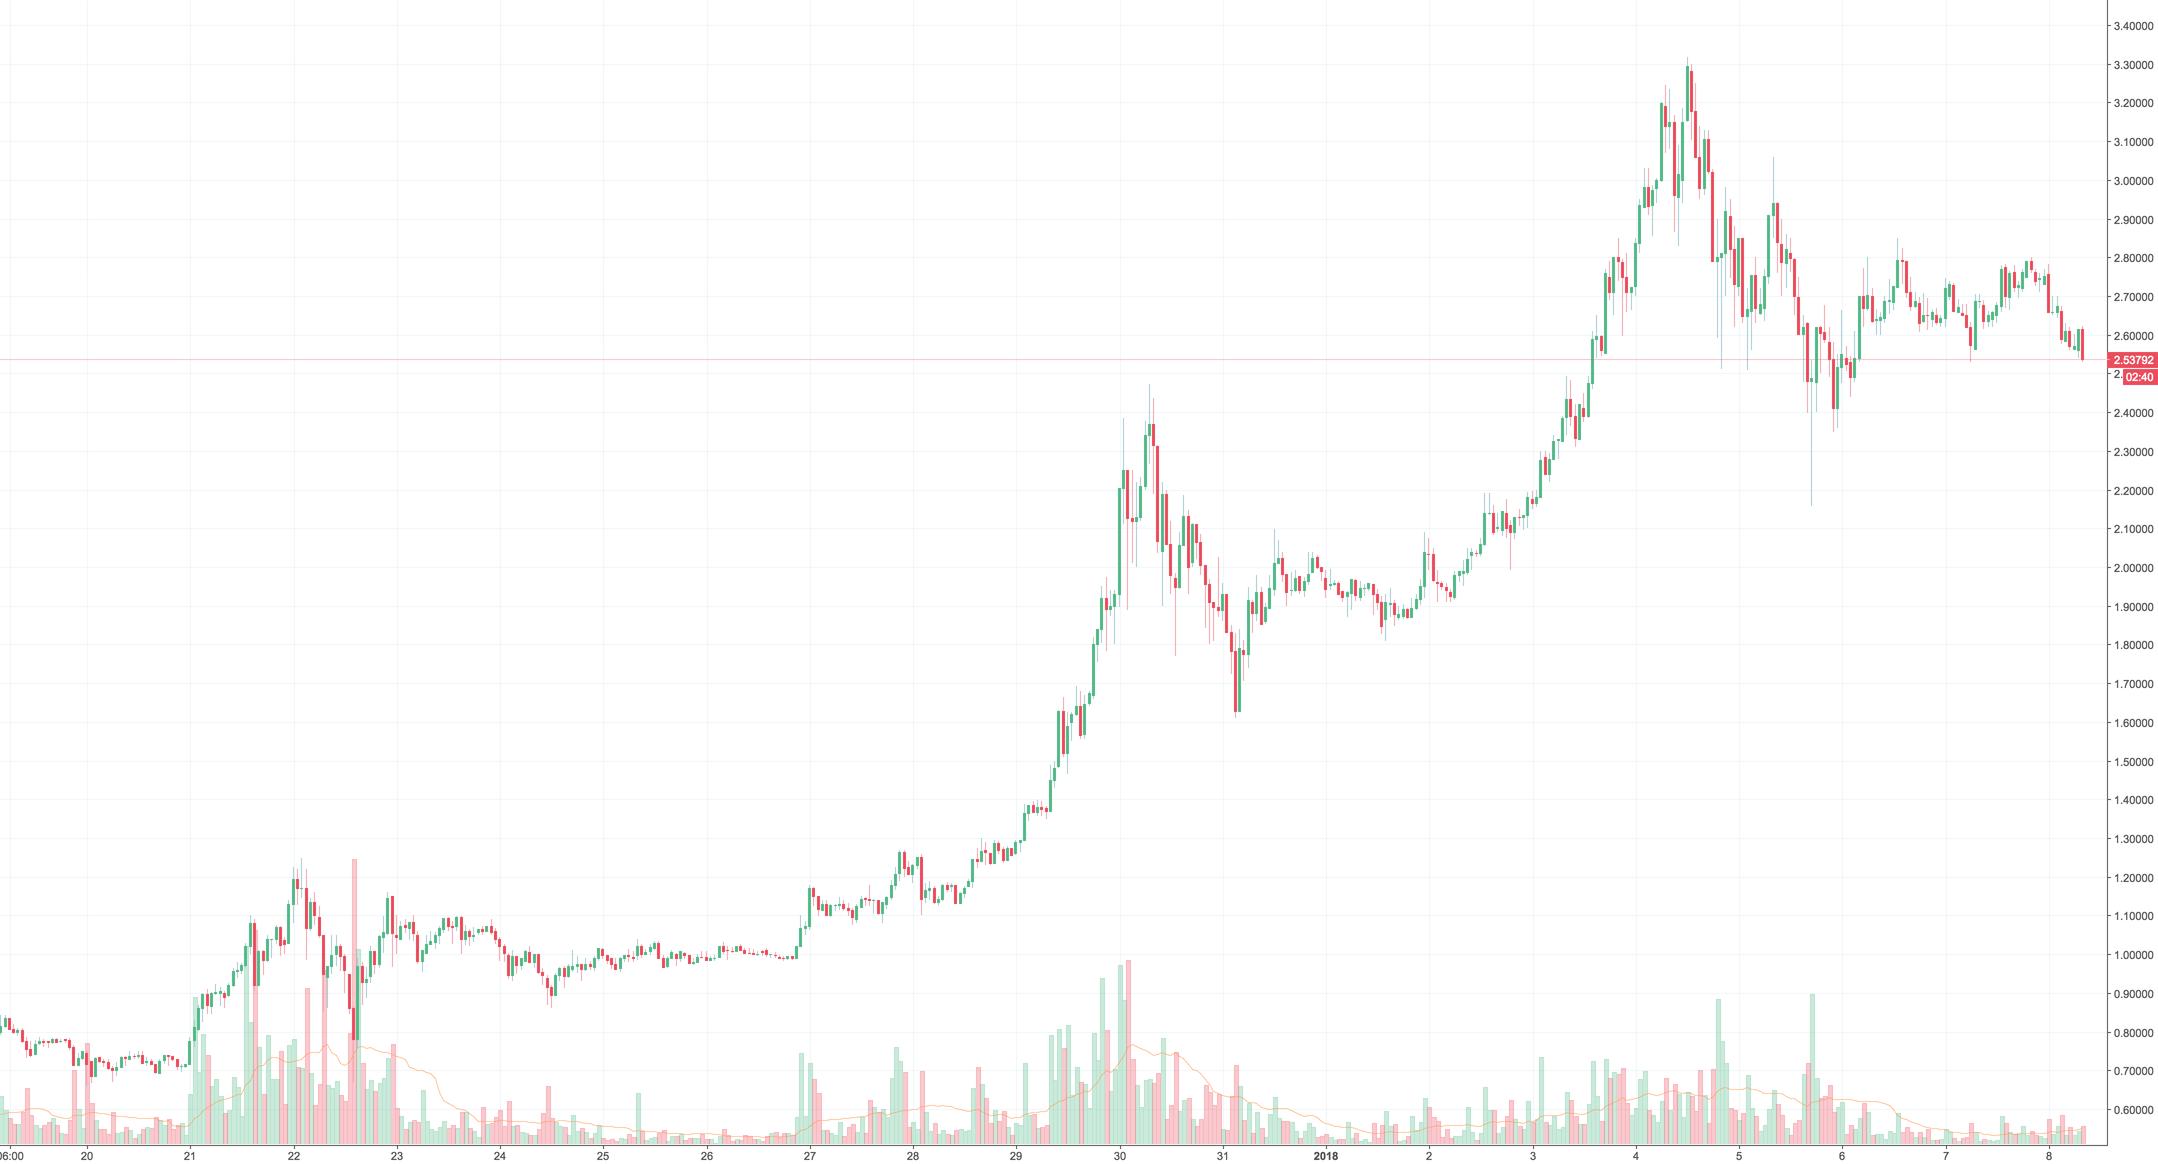 CRYPTOFAIL: RIP Ripple - IOTA Tangle USD Pegged Crypto For Banks